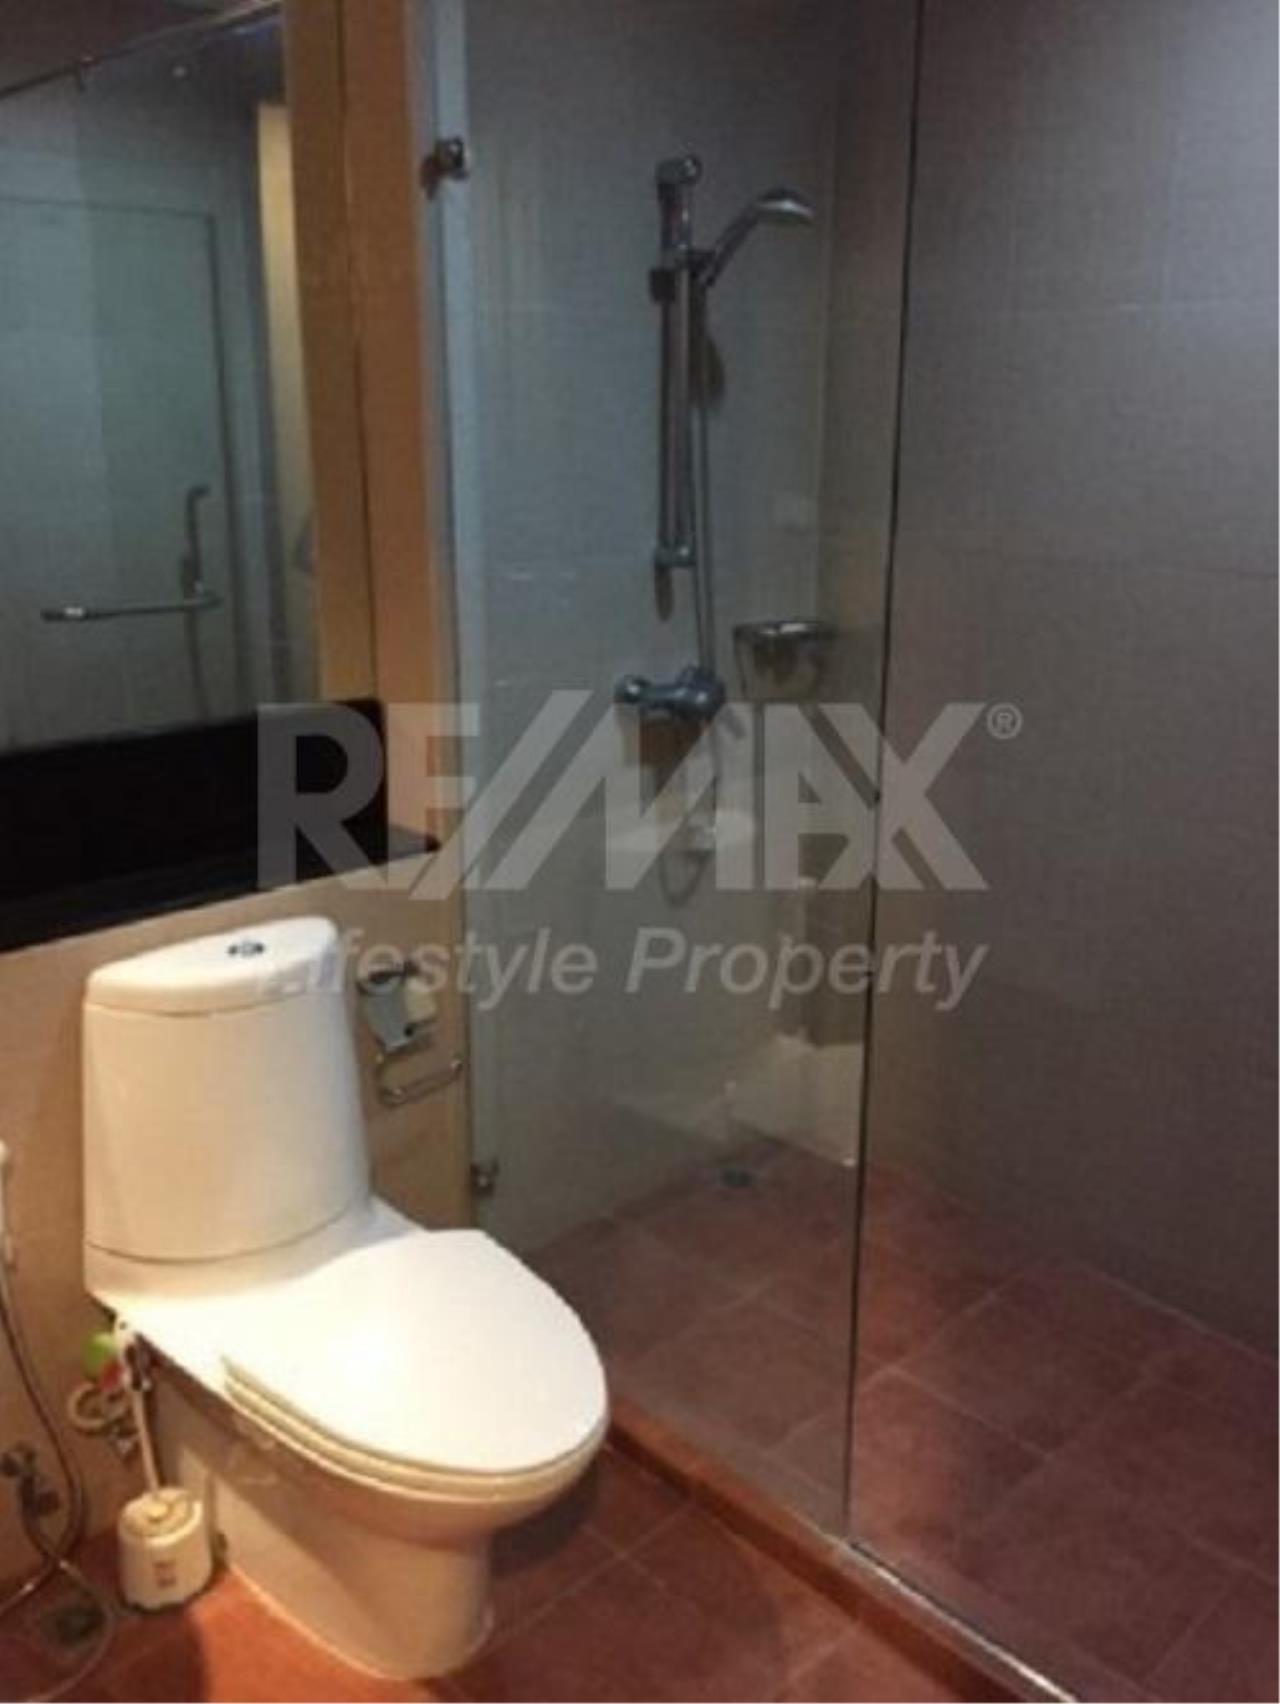 RE/MAX LifeStyle Property Agency's Baan Rajprasong 11